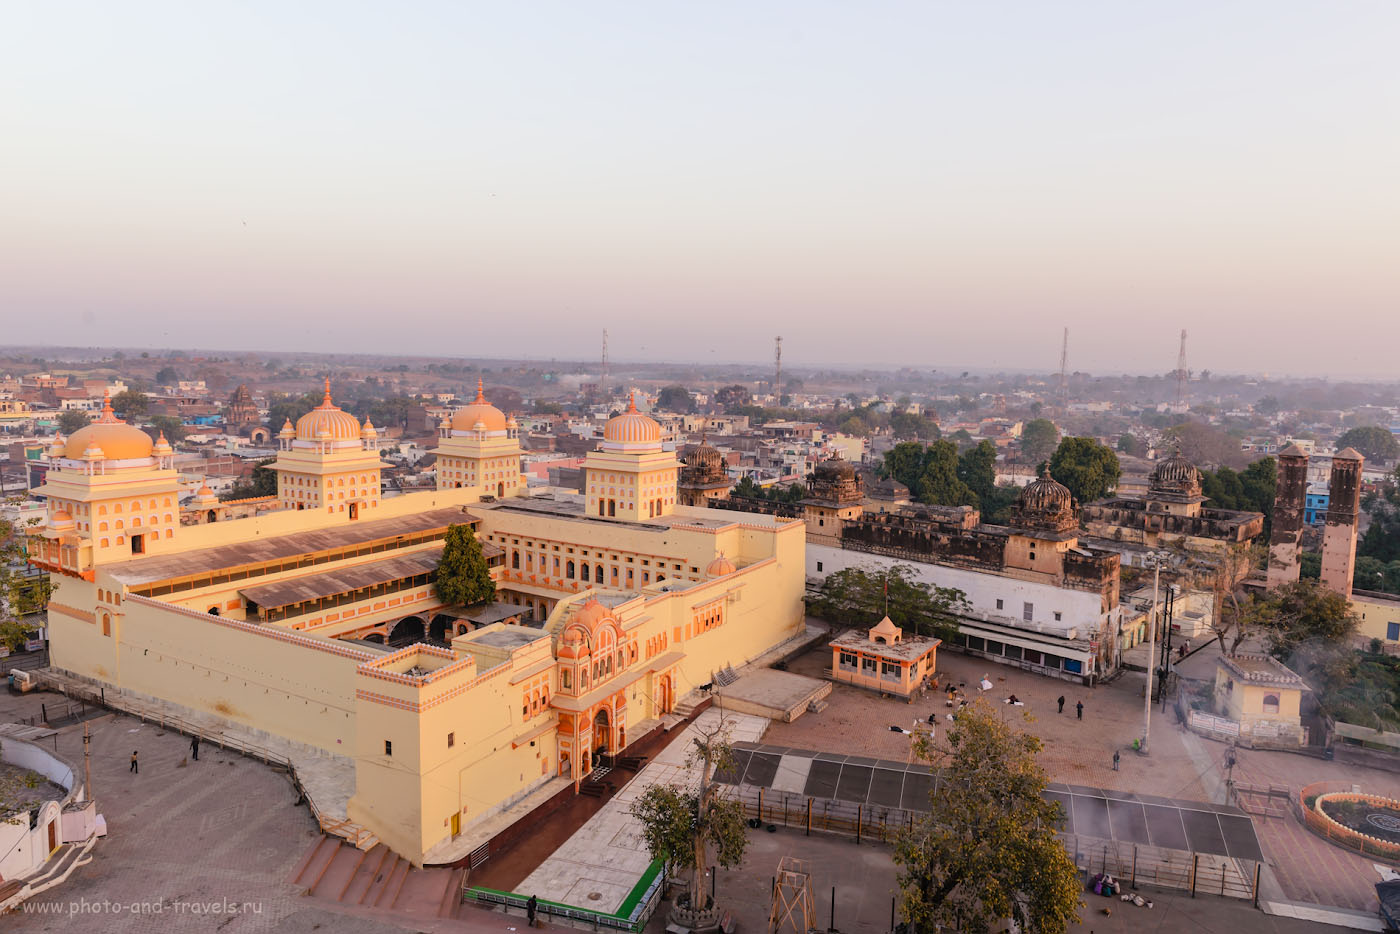 Фотография 15. Вид с крыши храма Чатурбхудж Мандир на Рам Раджа. 1/50, -0.33, 8.0, 180, 24.